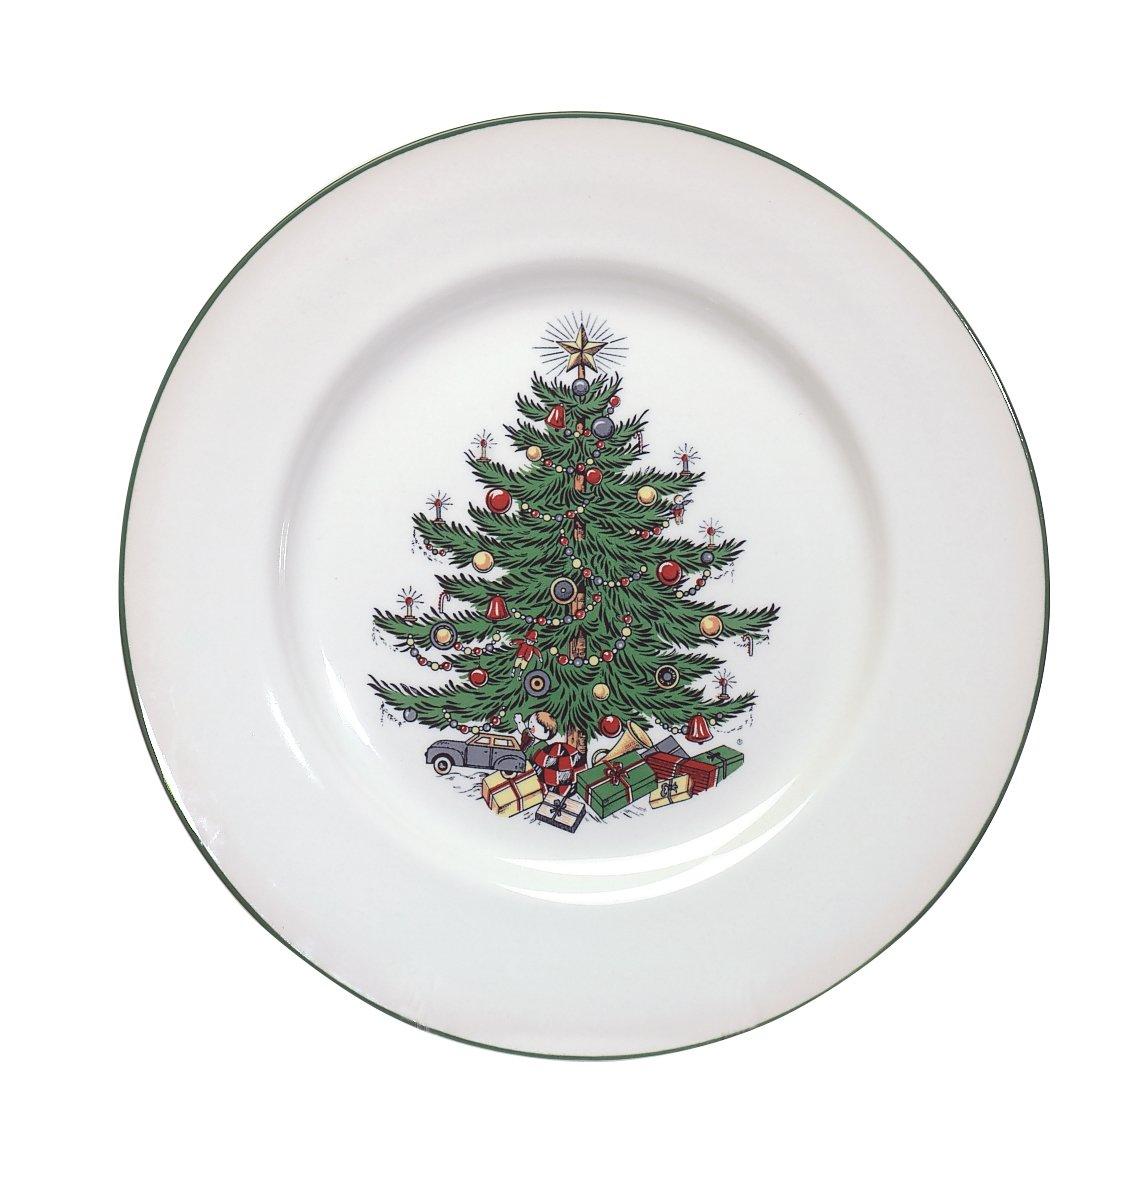 100 Spode Christmas Tree Gold Spode Christmas Plate